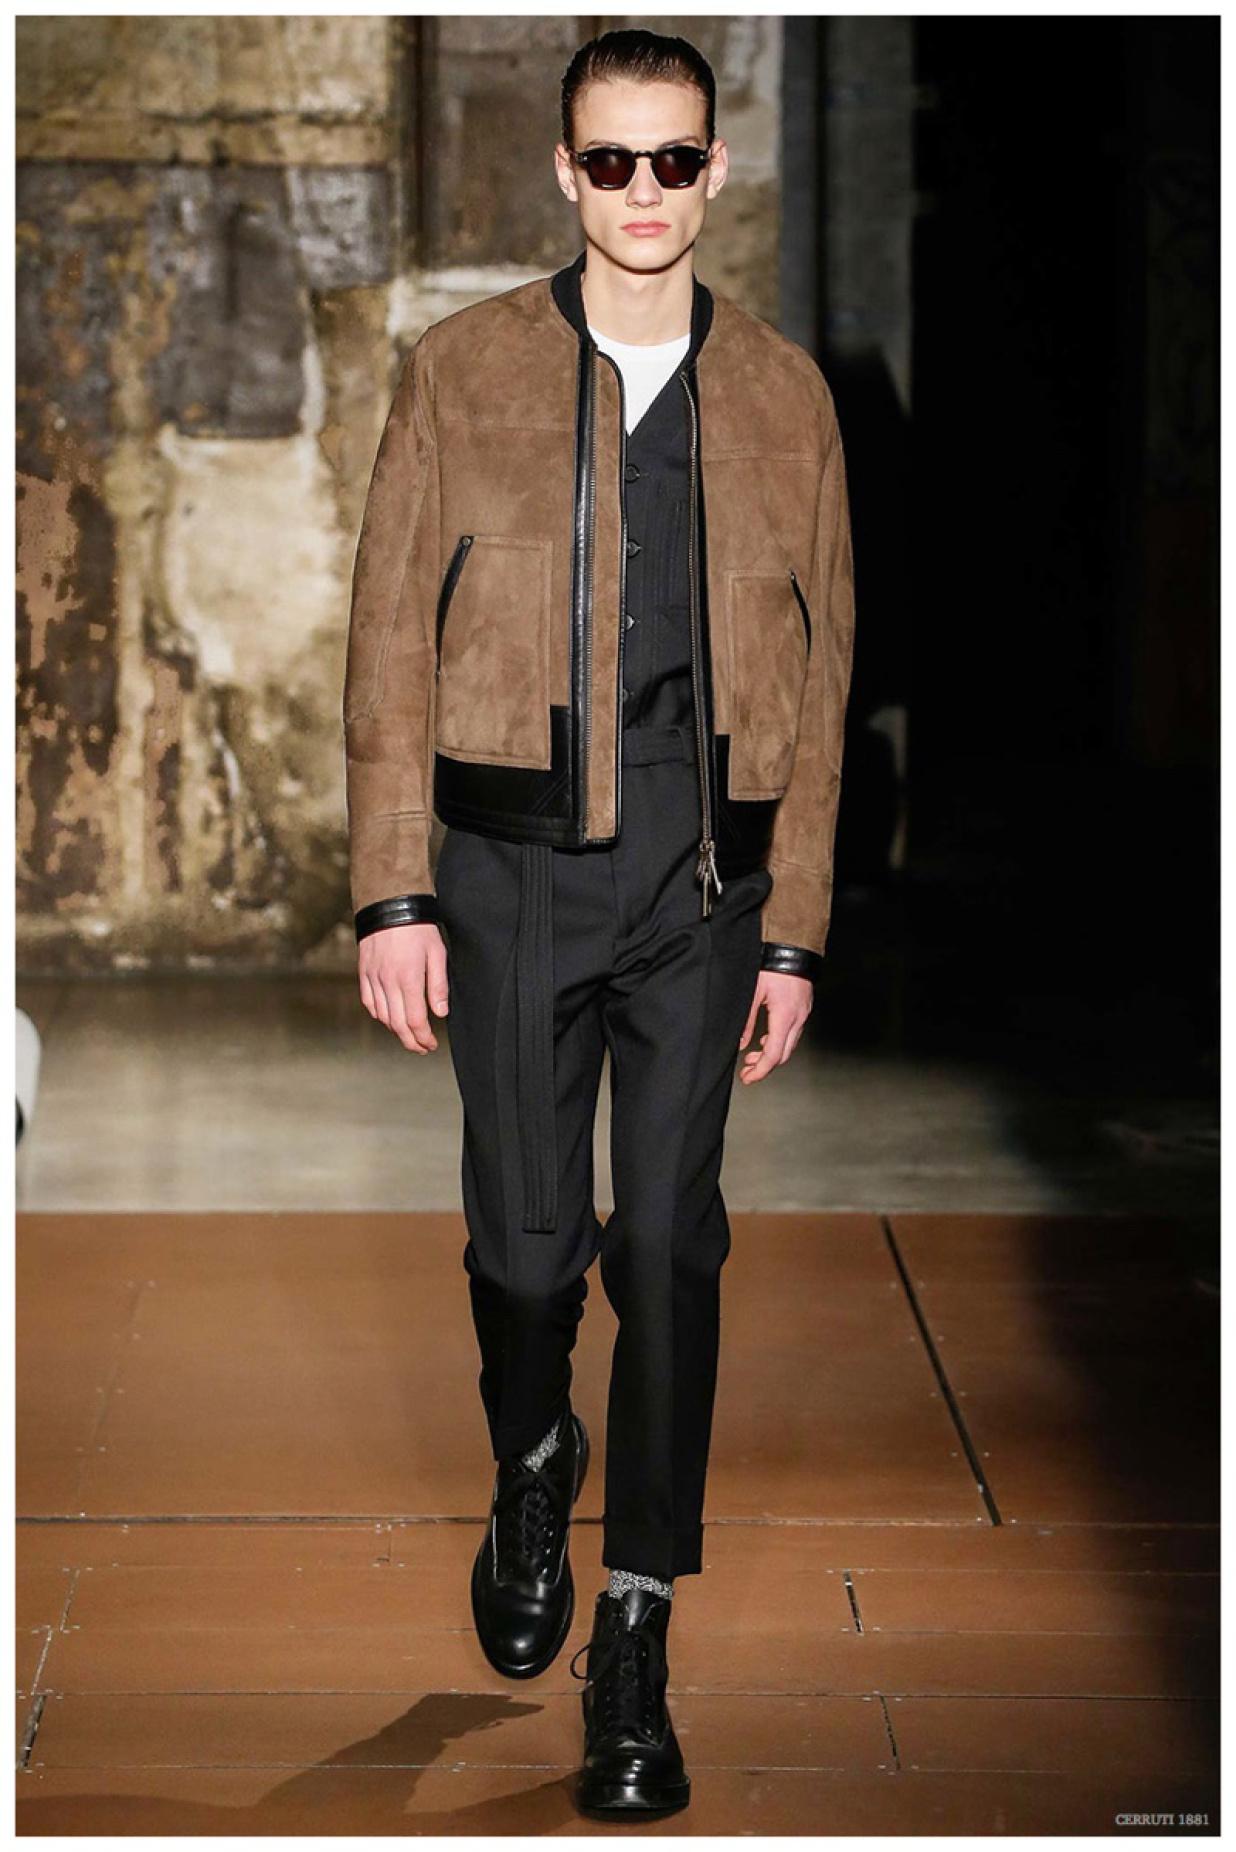 Cerruti-1881-Fall-Winter-2015-Menswear-Collection-Paris-Fashion-Week-024